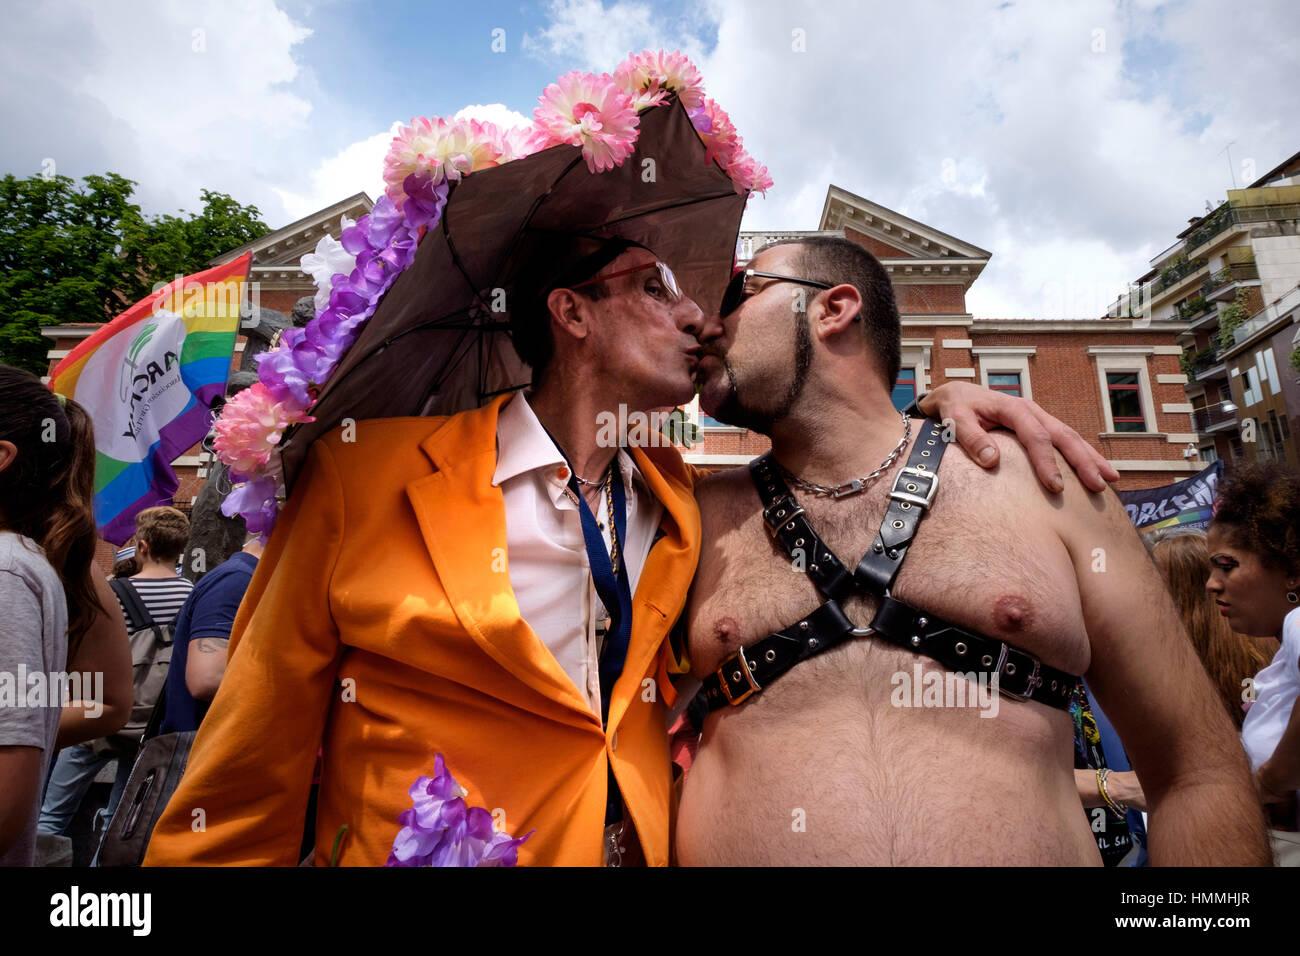 gay video in italiano escort massaggi varese